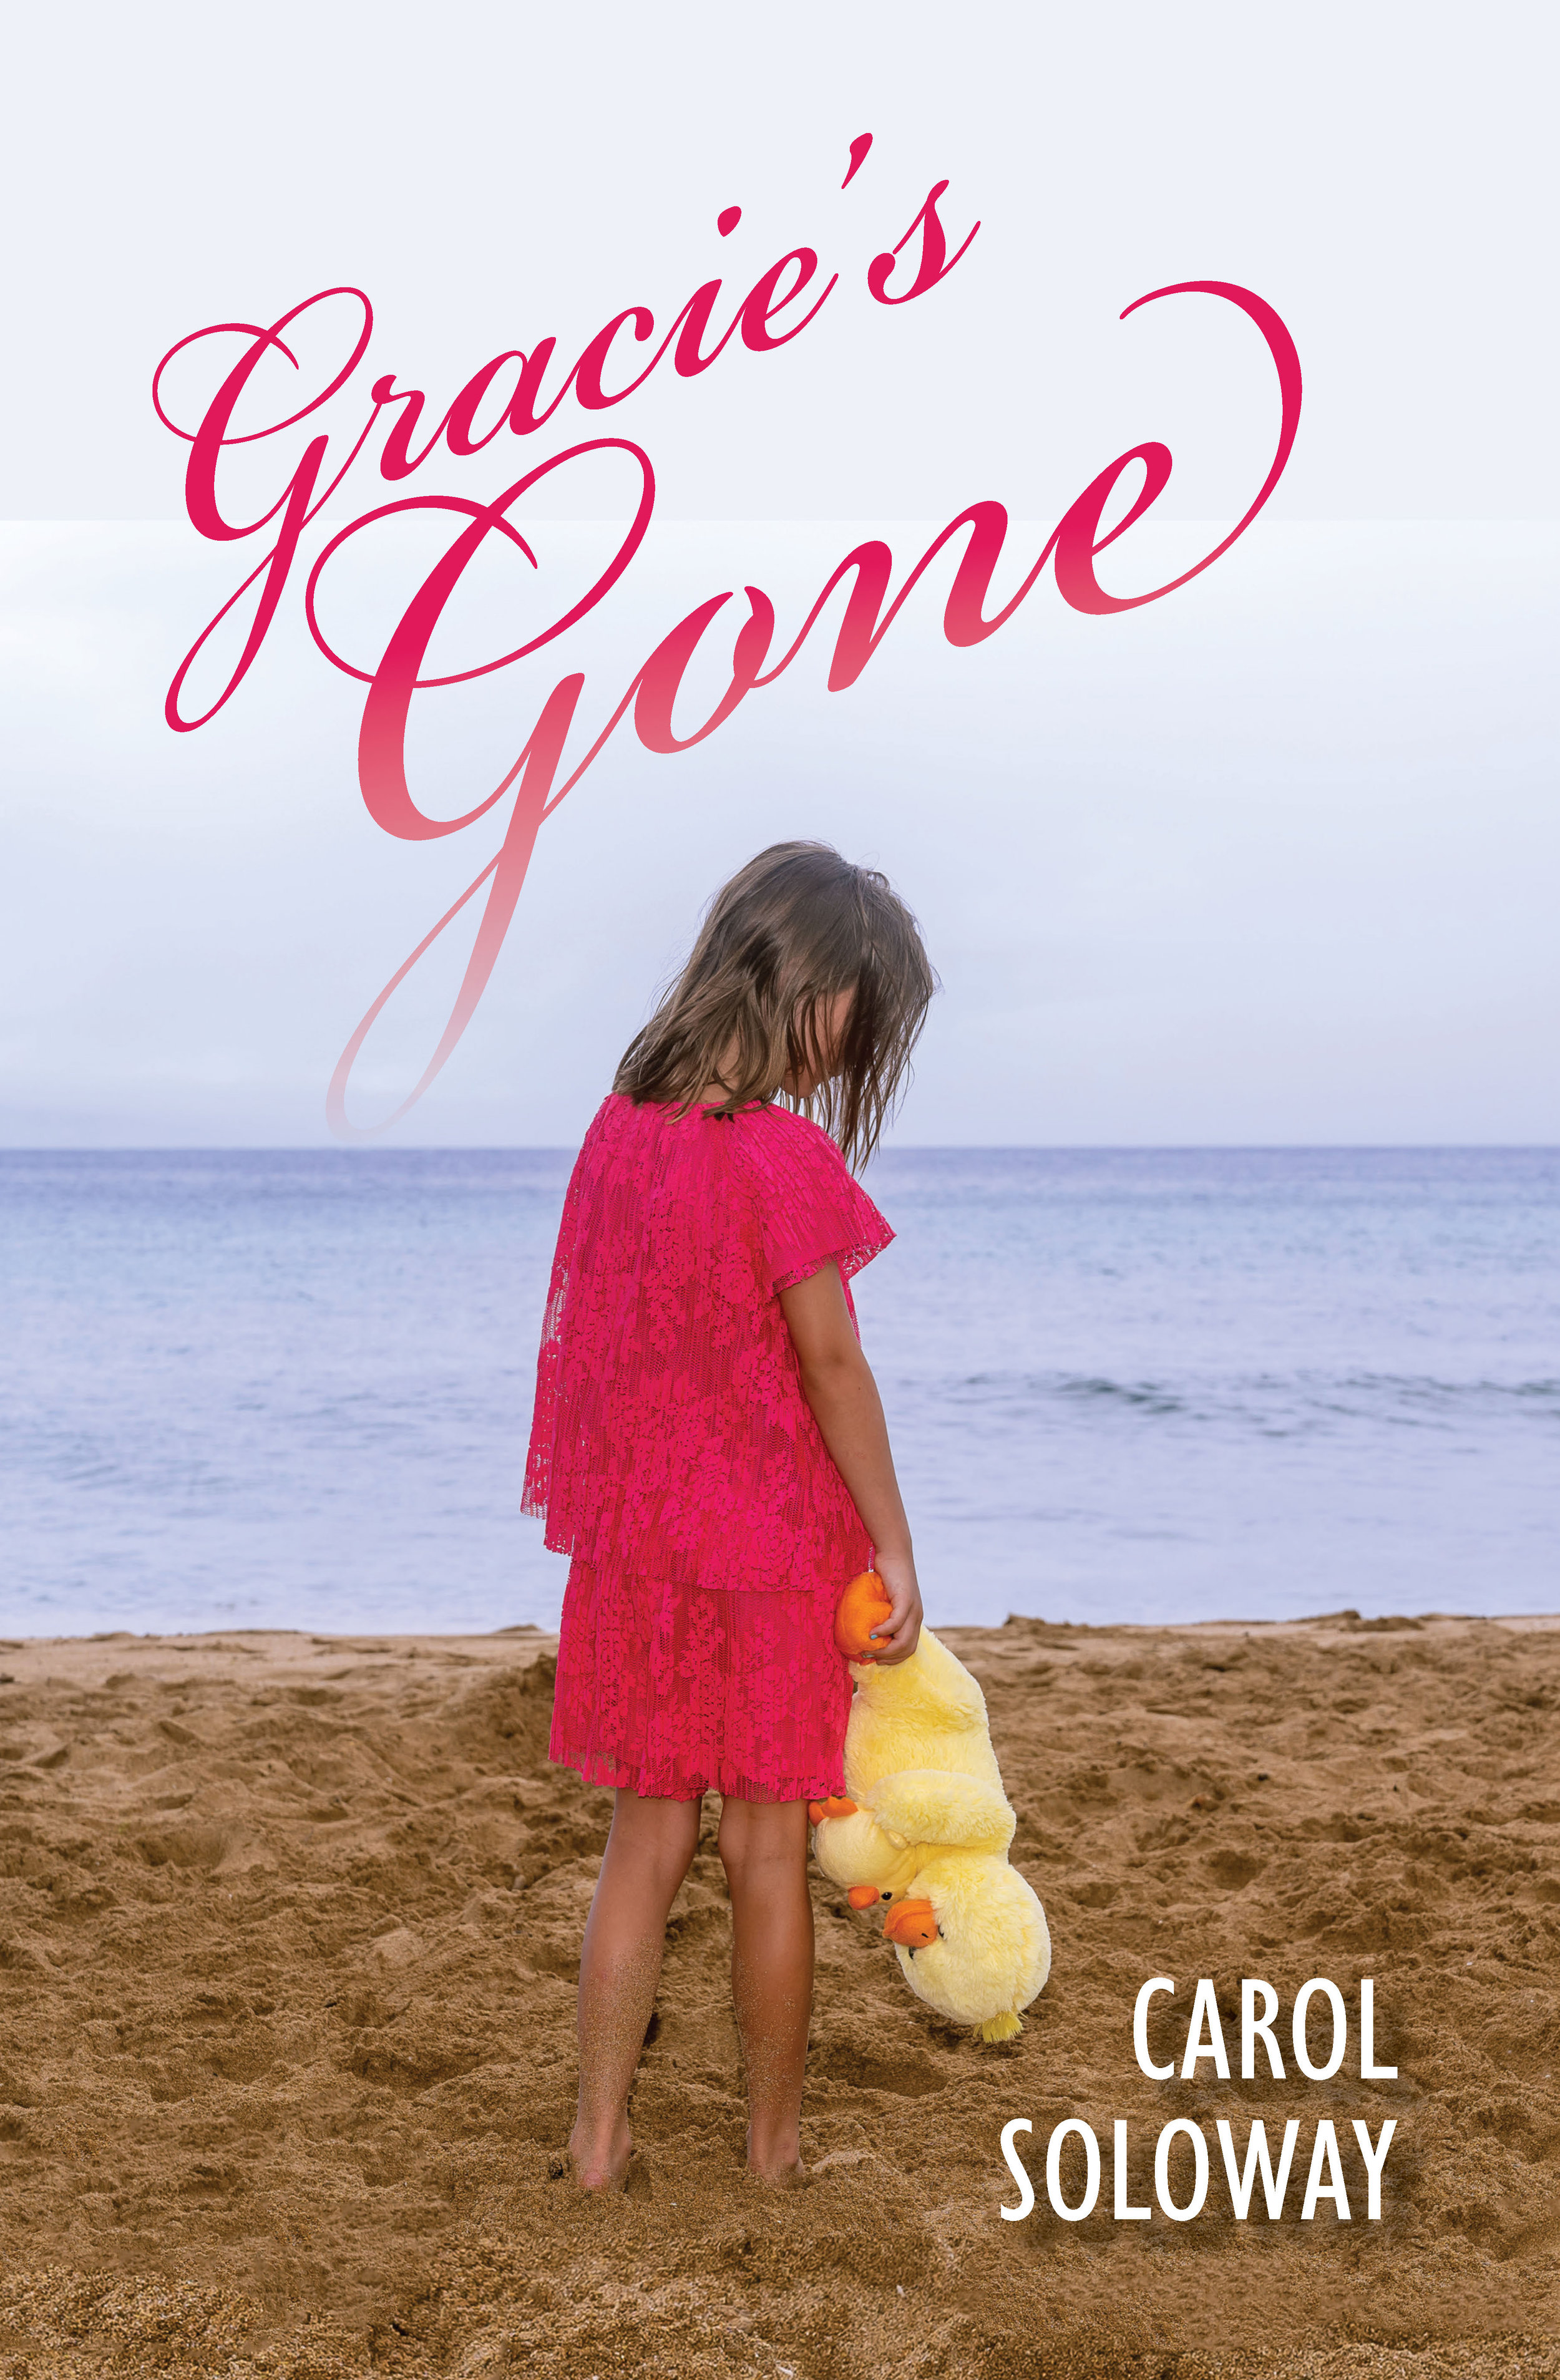 Gracie's Gone Carol Solloway_Cover.jpg